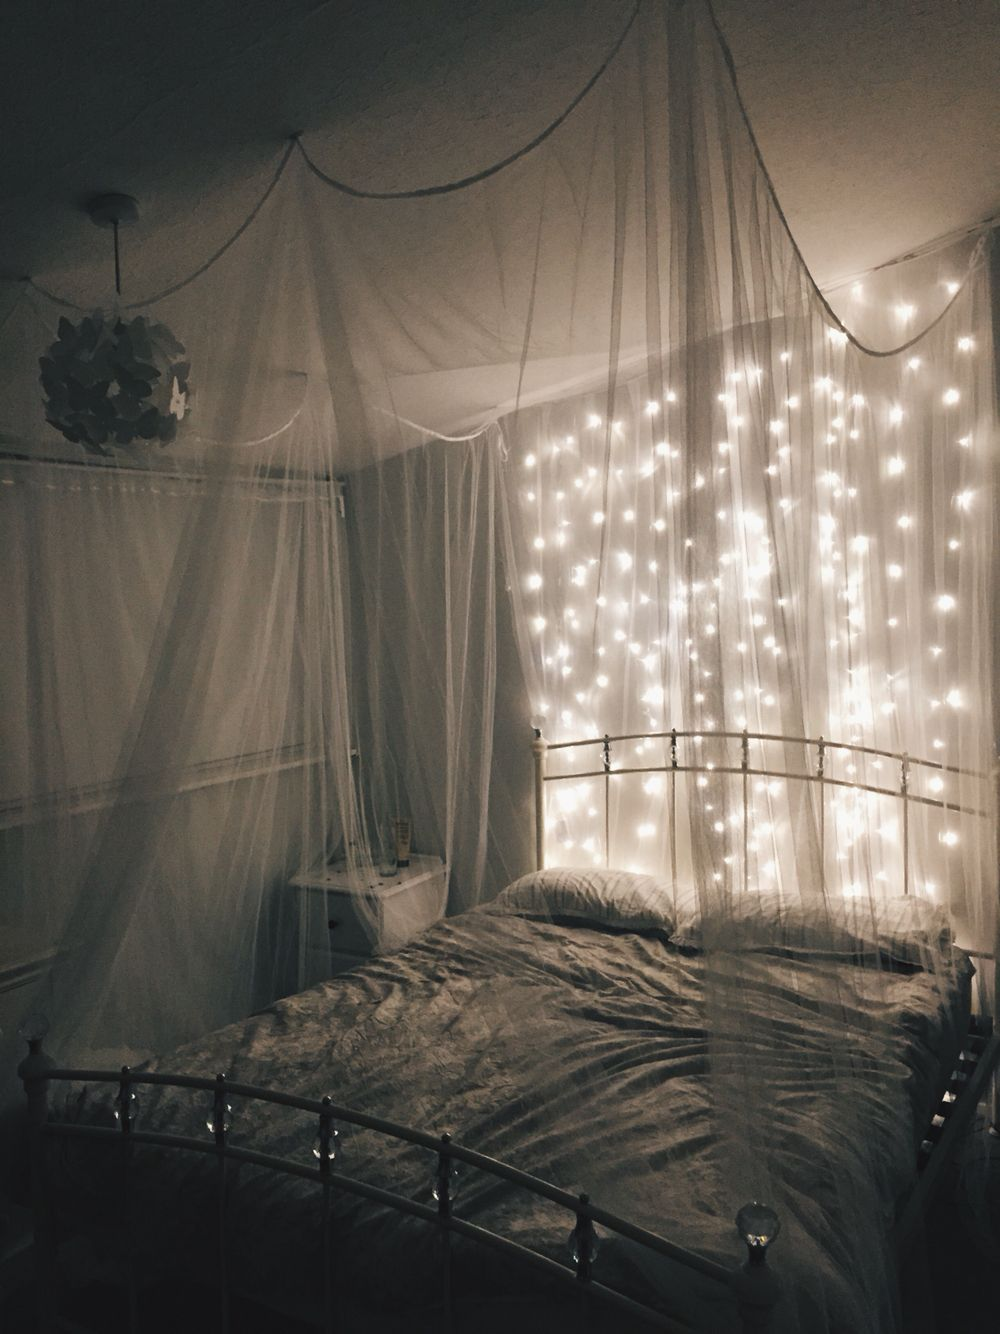 My Dreamy Bedroom Bedroom Decor Lights Romantic Bedroom Lighting Relaxing Bedroom Romantic bedroom lighting ideas